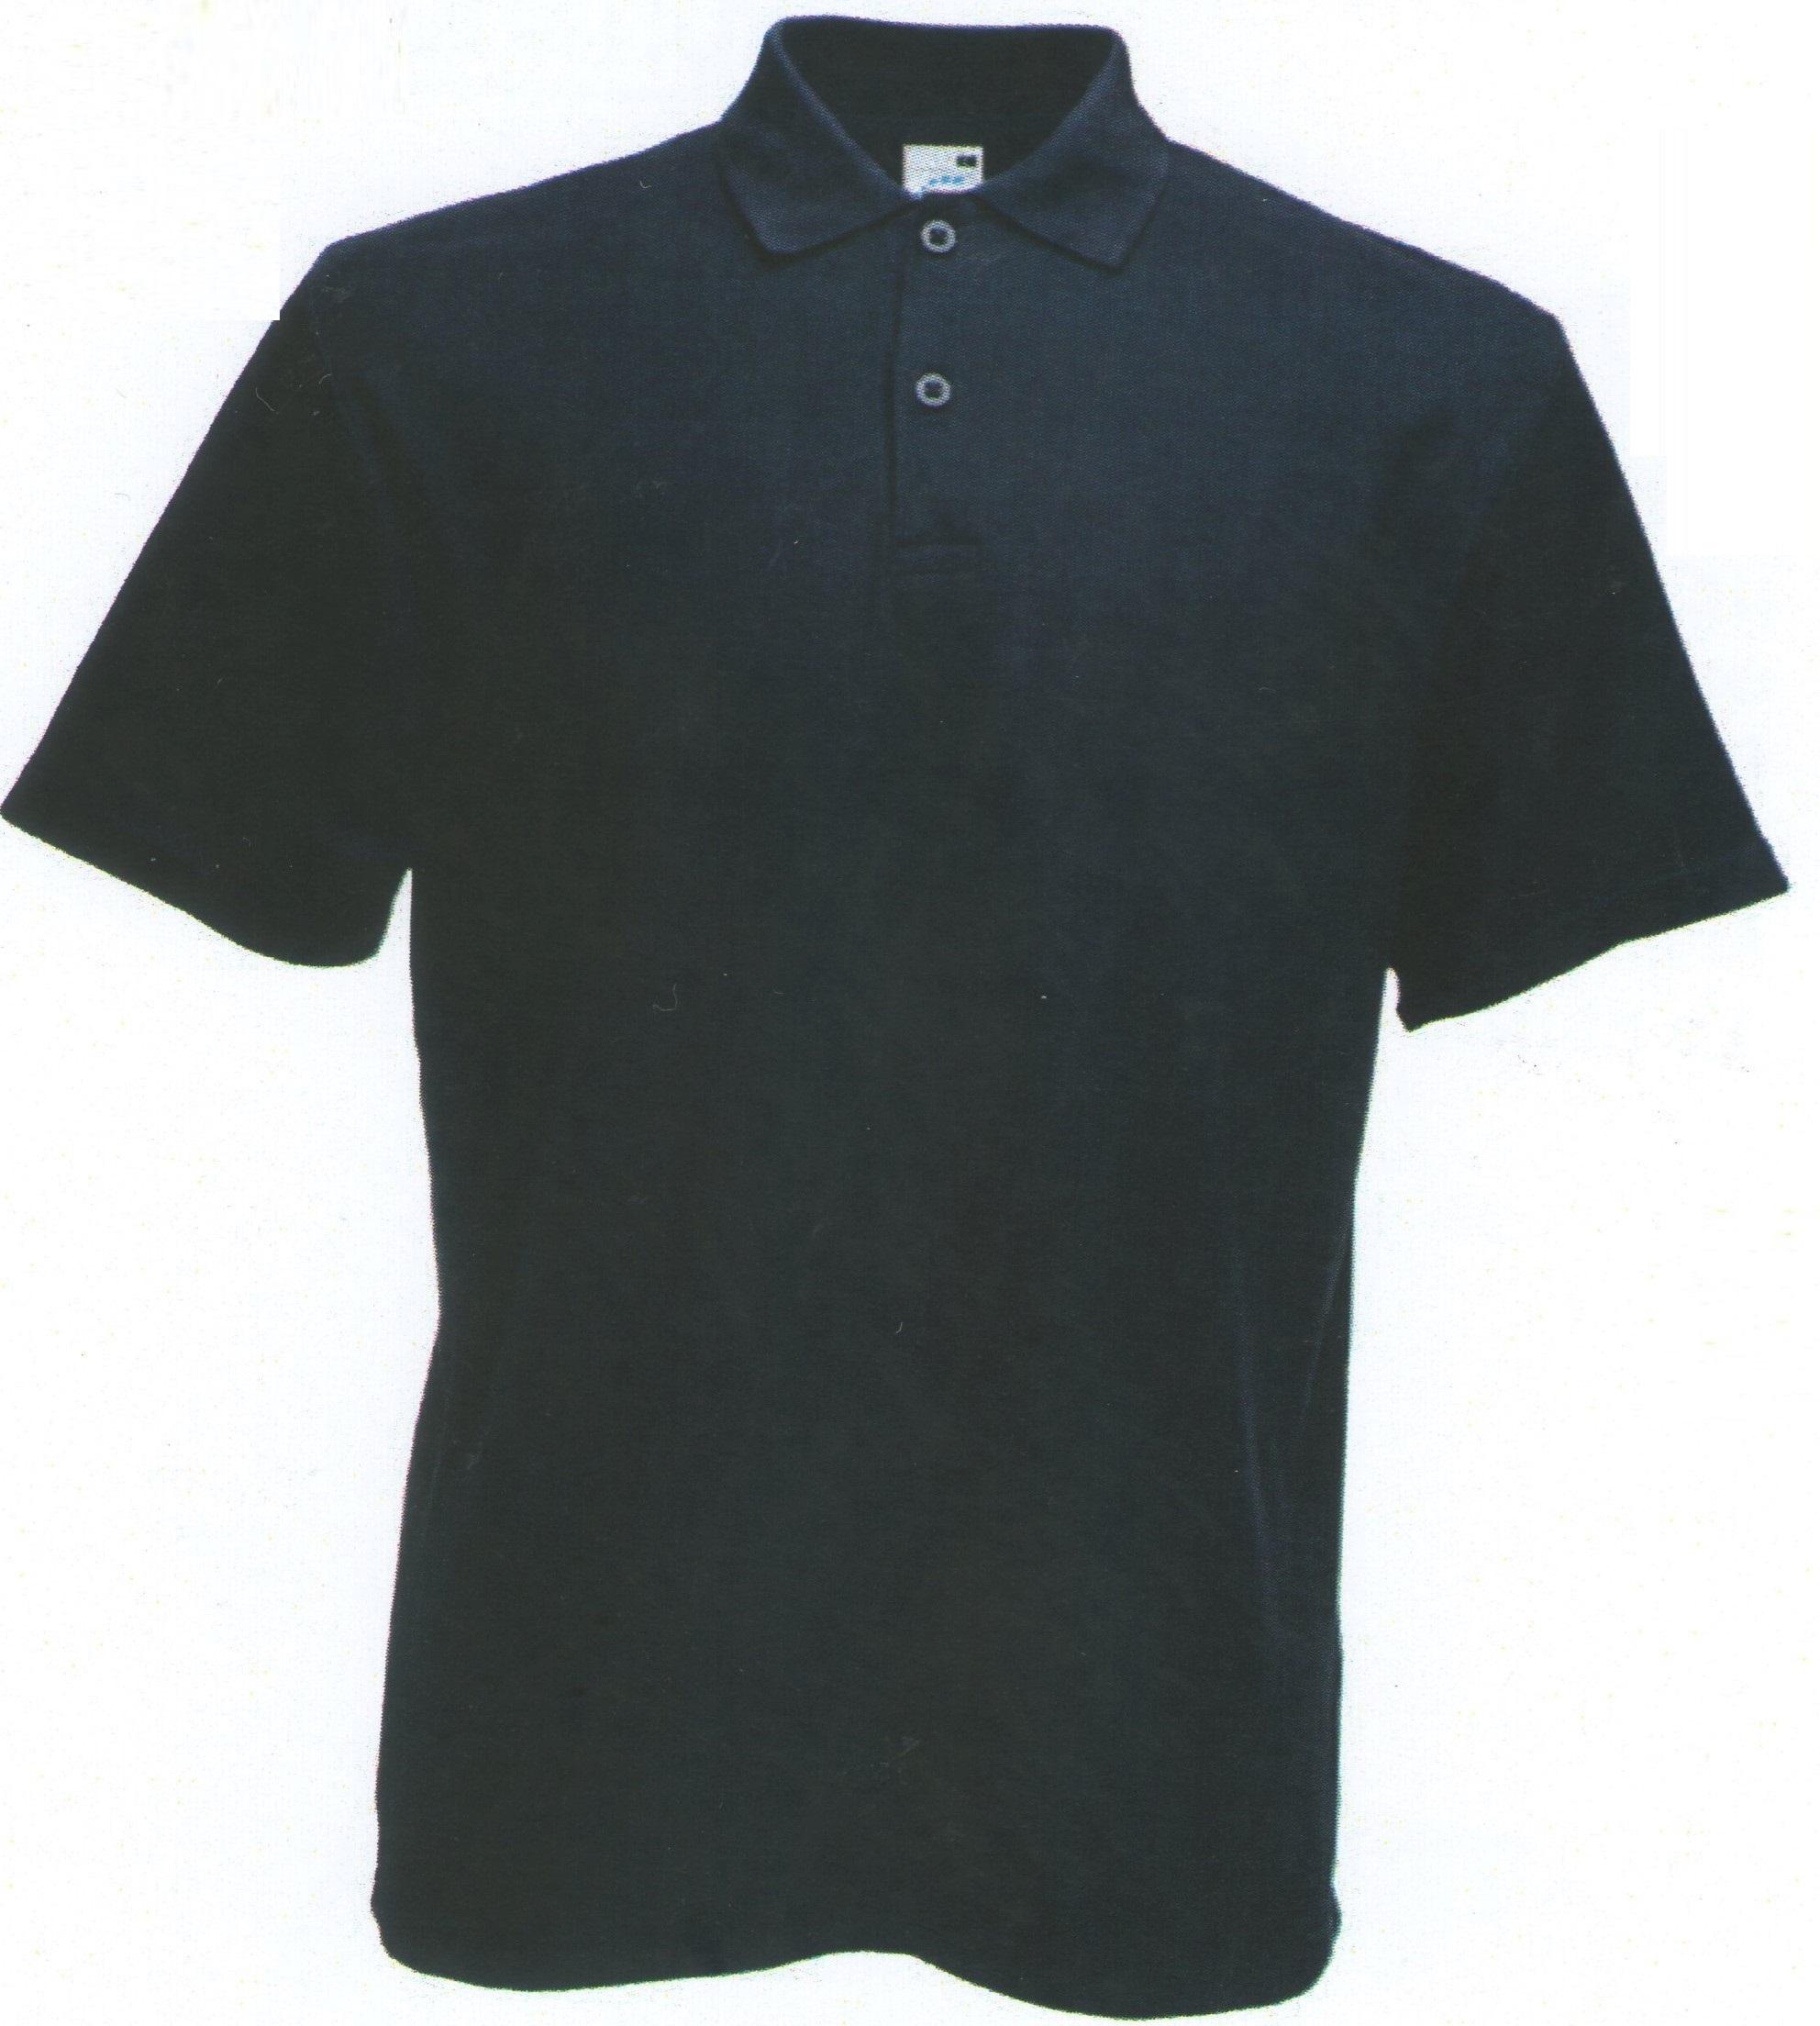 Polo από 65% Polyester & 35% Βαμβάκι. Βάρος Λευκό 170gr Χρωματιστό 180gr Μέγεθος S-XXXL Σε ευρεία γκάμα χρωμάτων